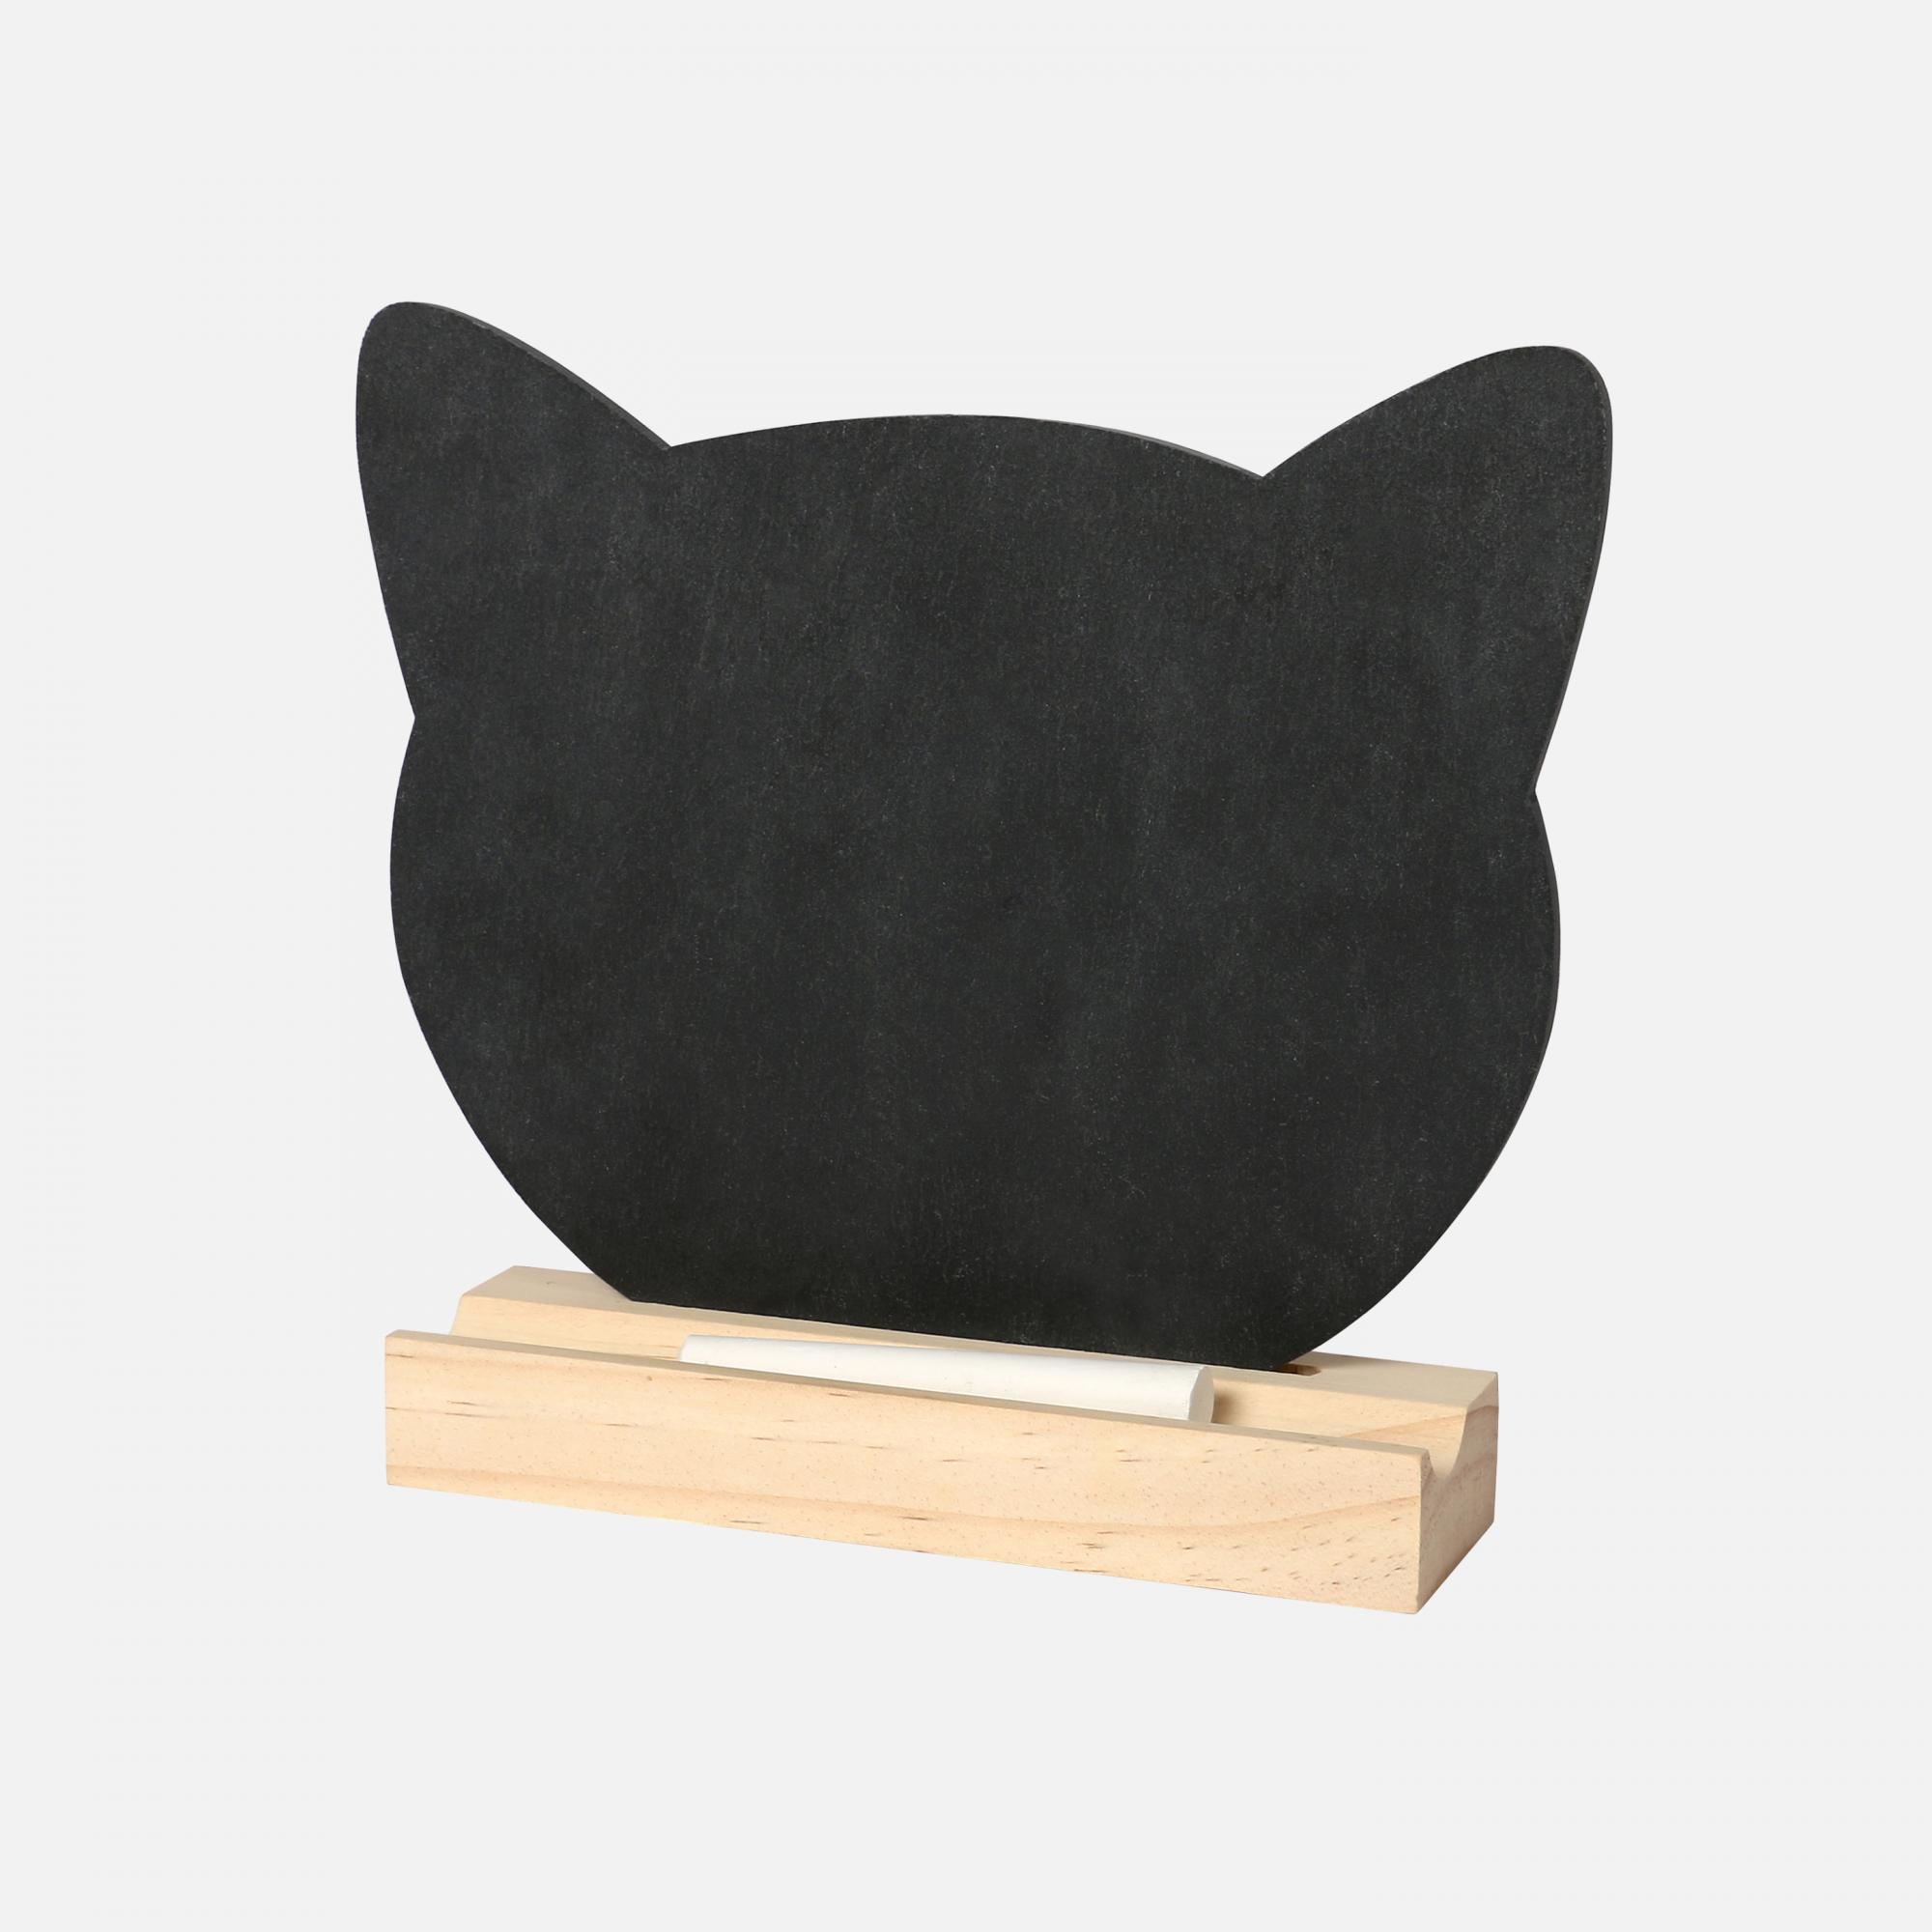 Ardoise a poser chat de wouapy